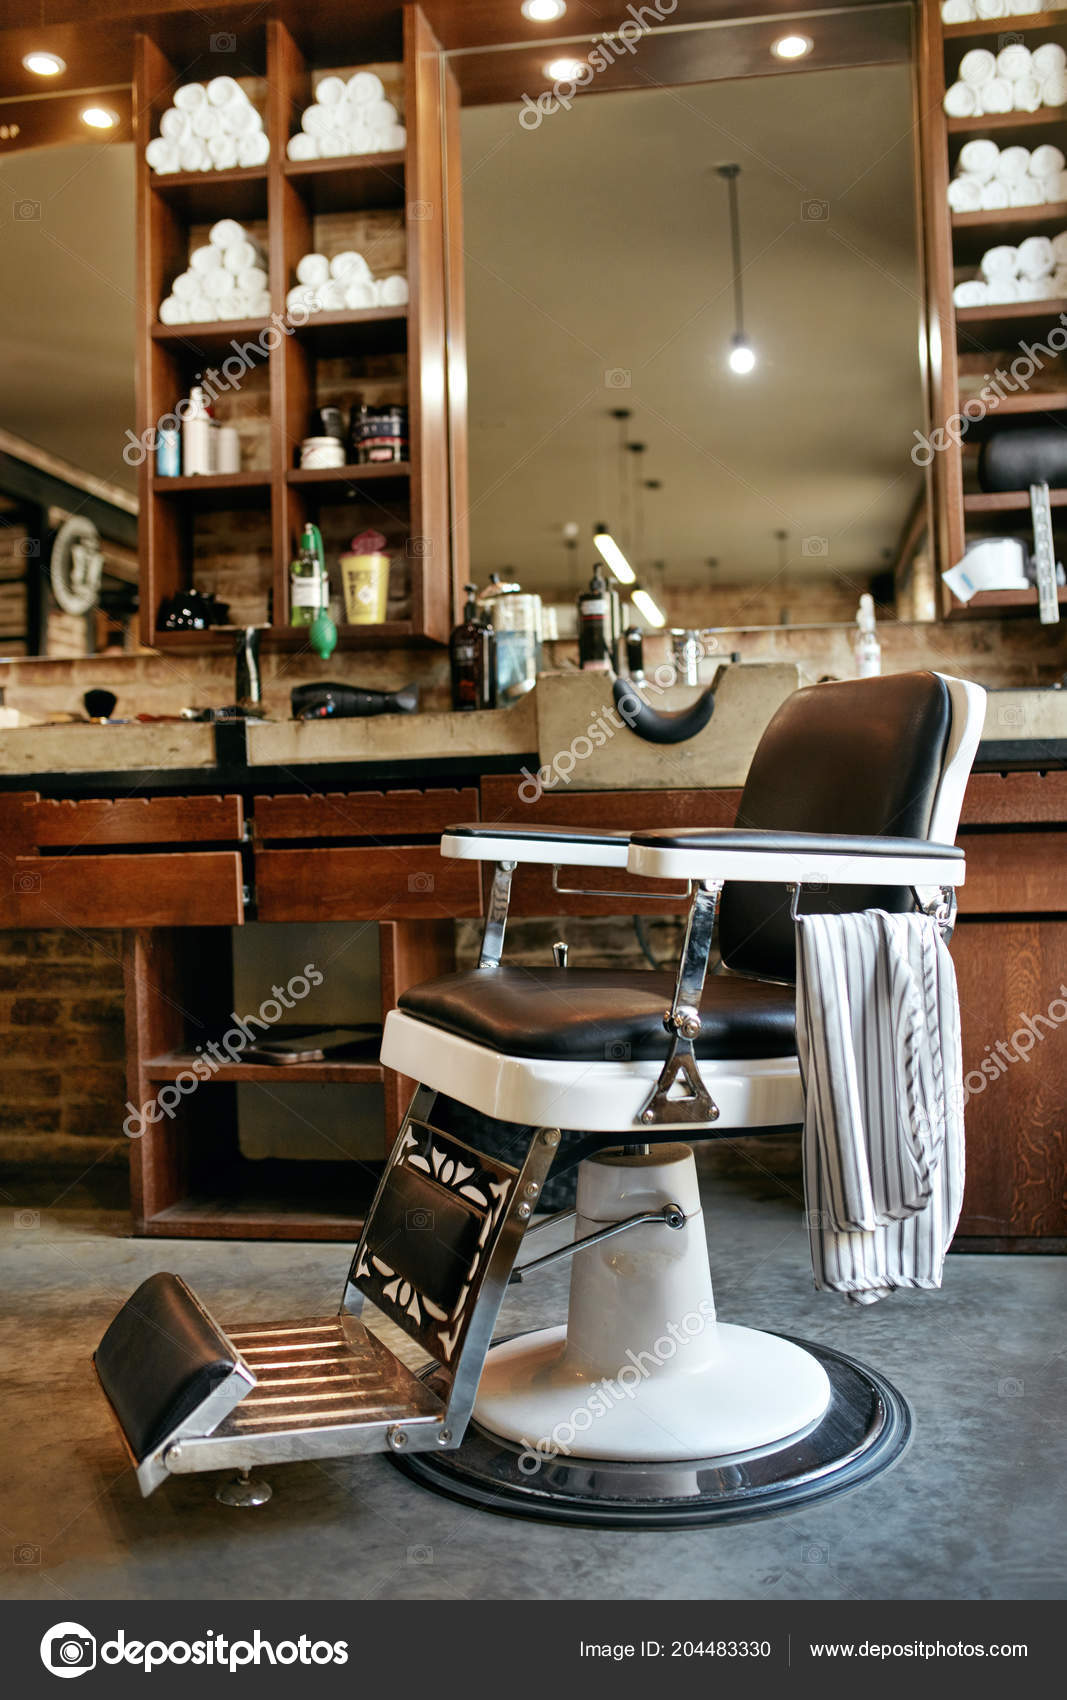 Iictures Barber Shop Interiors Barber Shop Interior Men Beauty Hair Salon Antique Chair Mirror Stock Photo C Puhhha 204483330